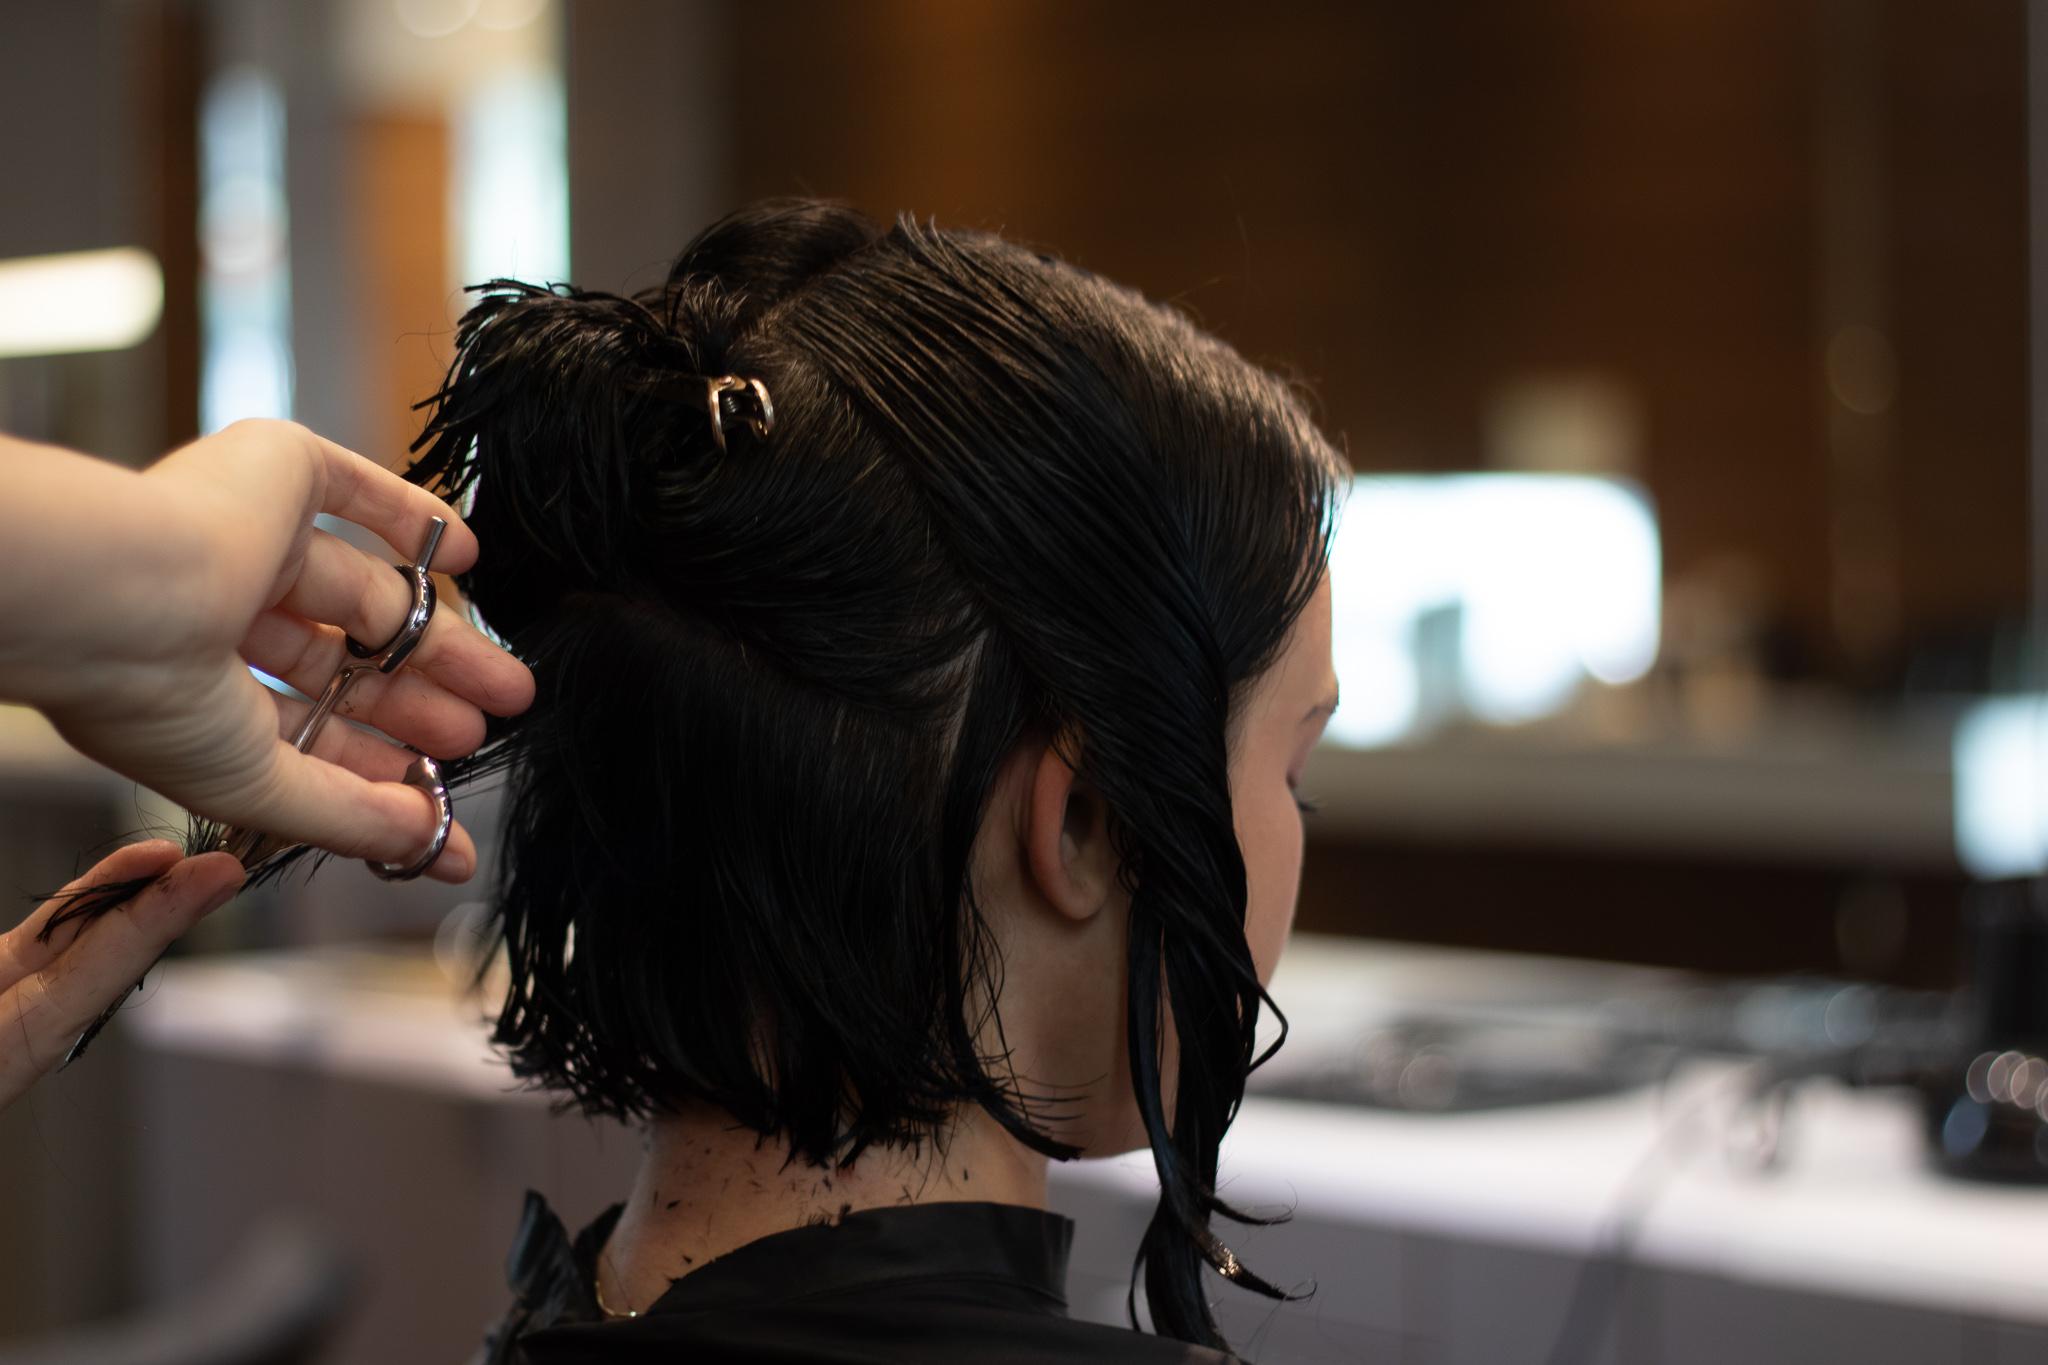 haircut, salon, pdx, portland, bob, short hair, long hair, brunette, transformation